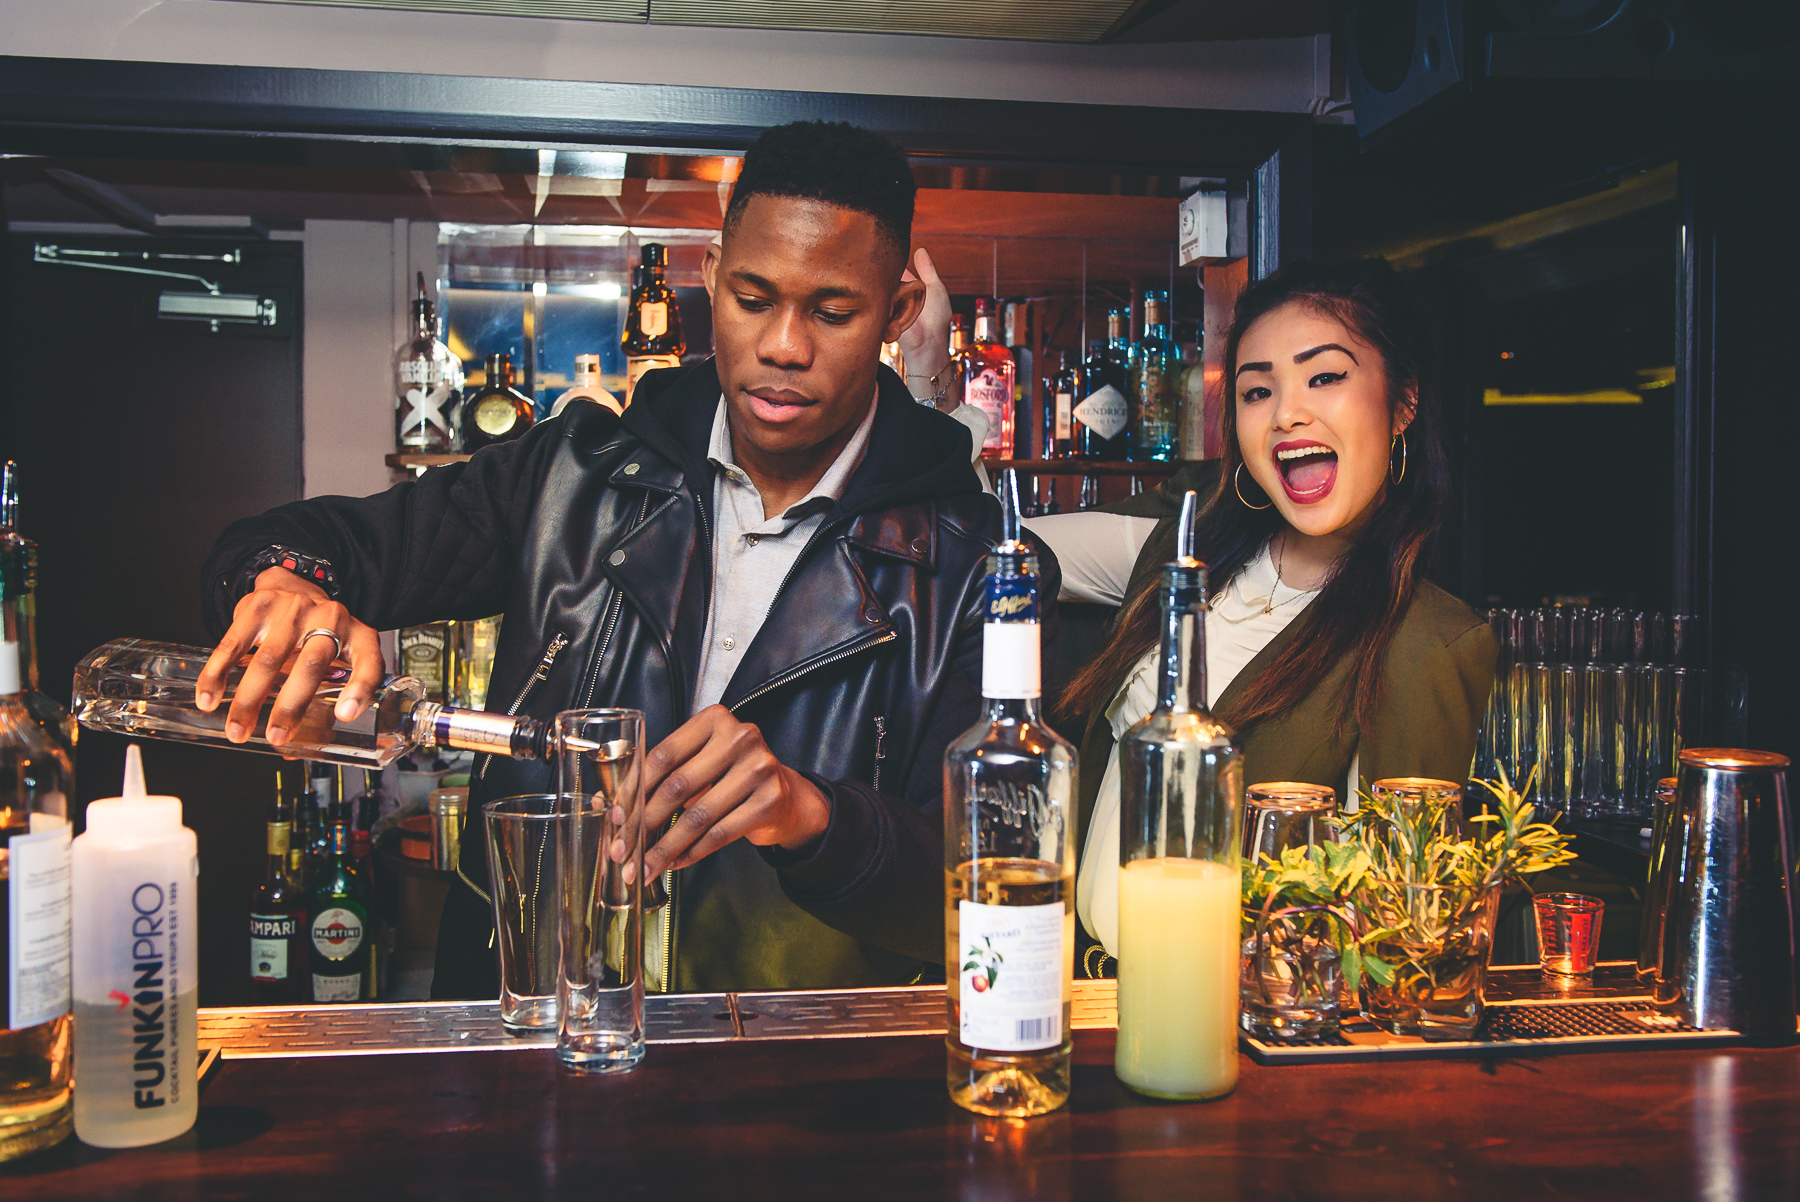 Angels cocktail bar Oxford 19.01.2019-32.jpg